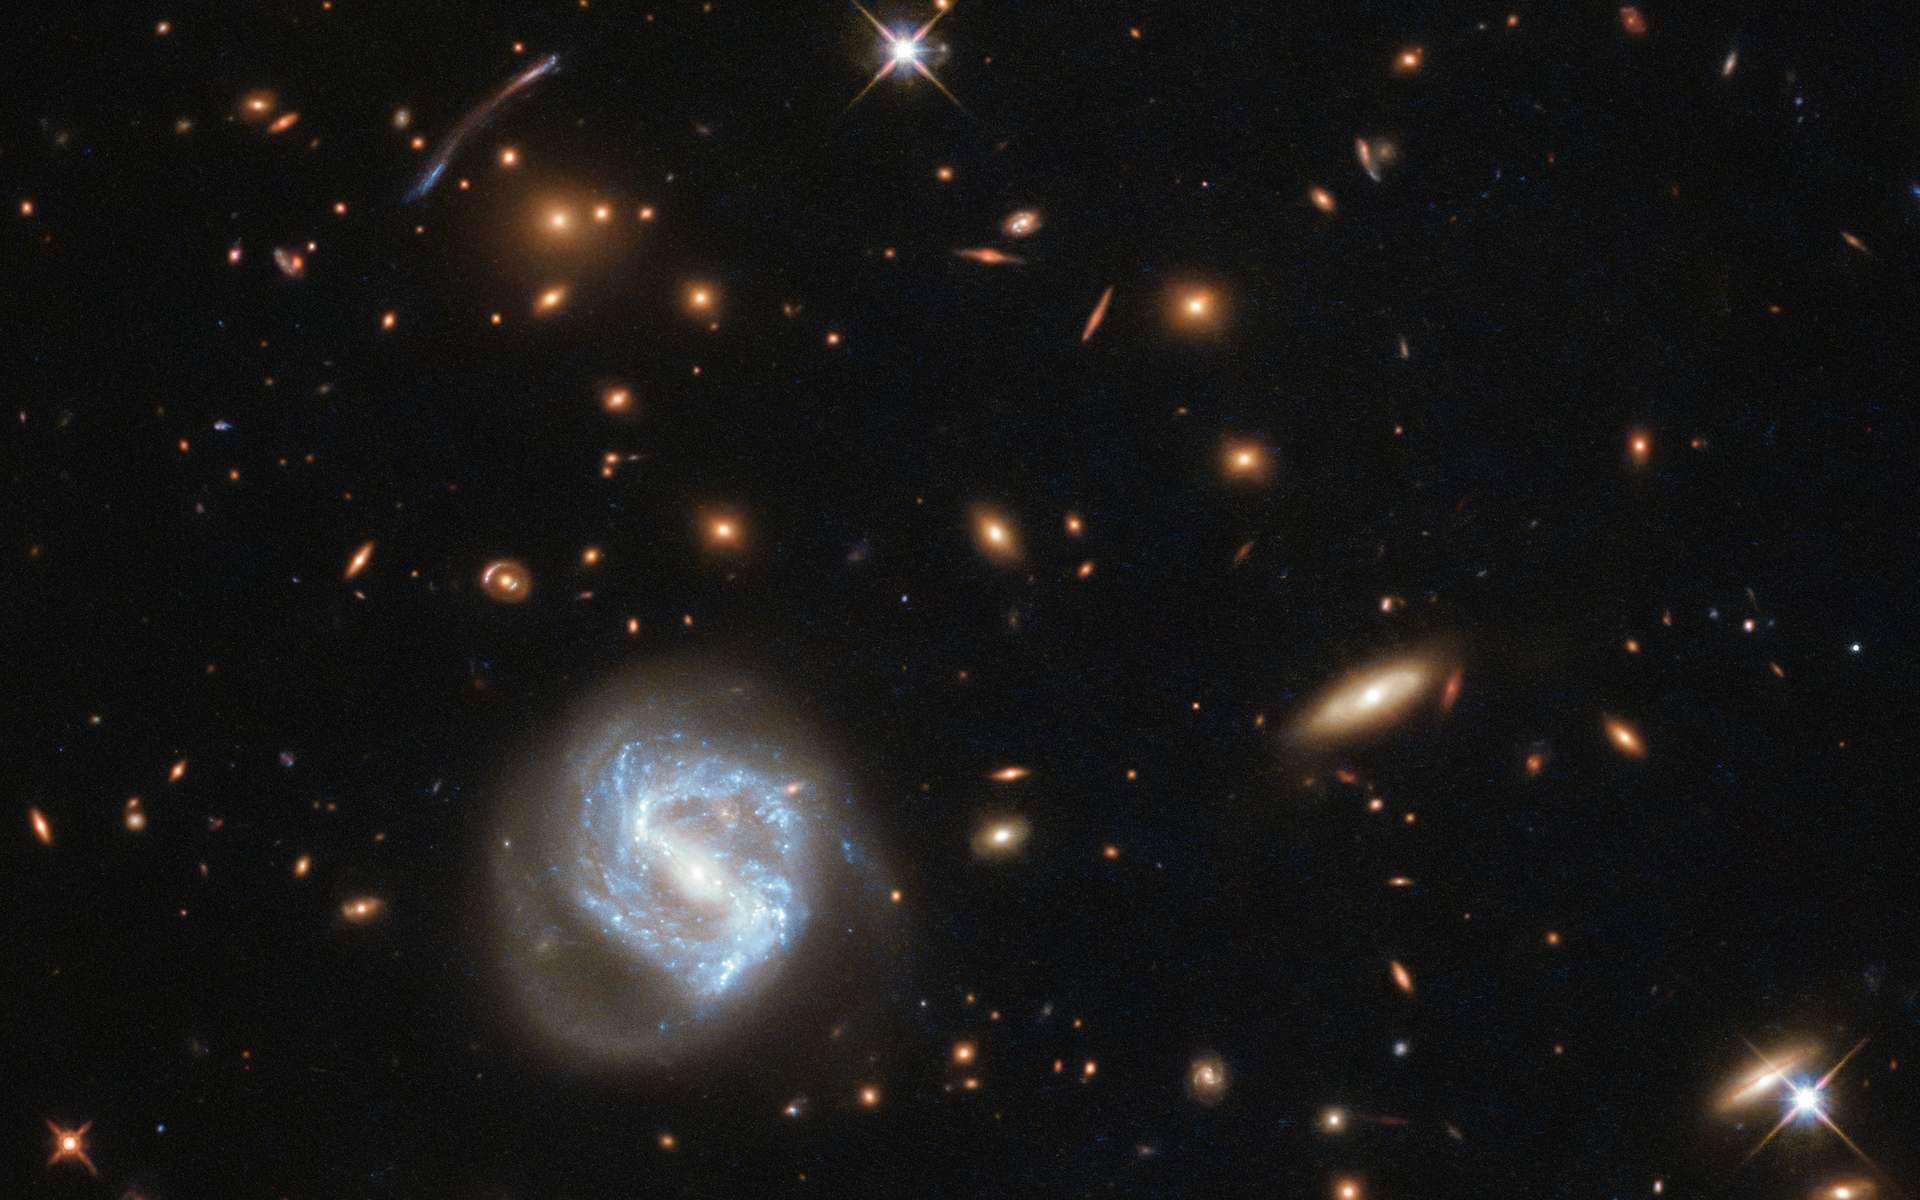 Le cluster galactique Cornucopia. © Nasa, Seti